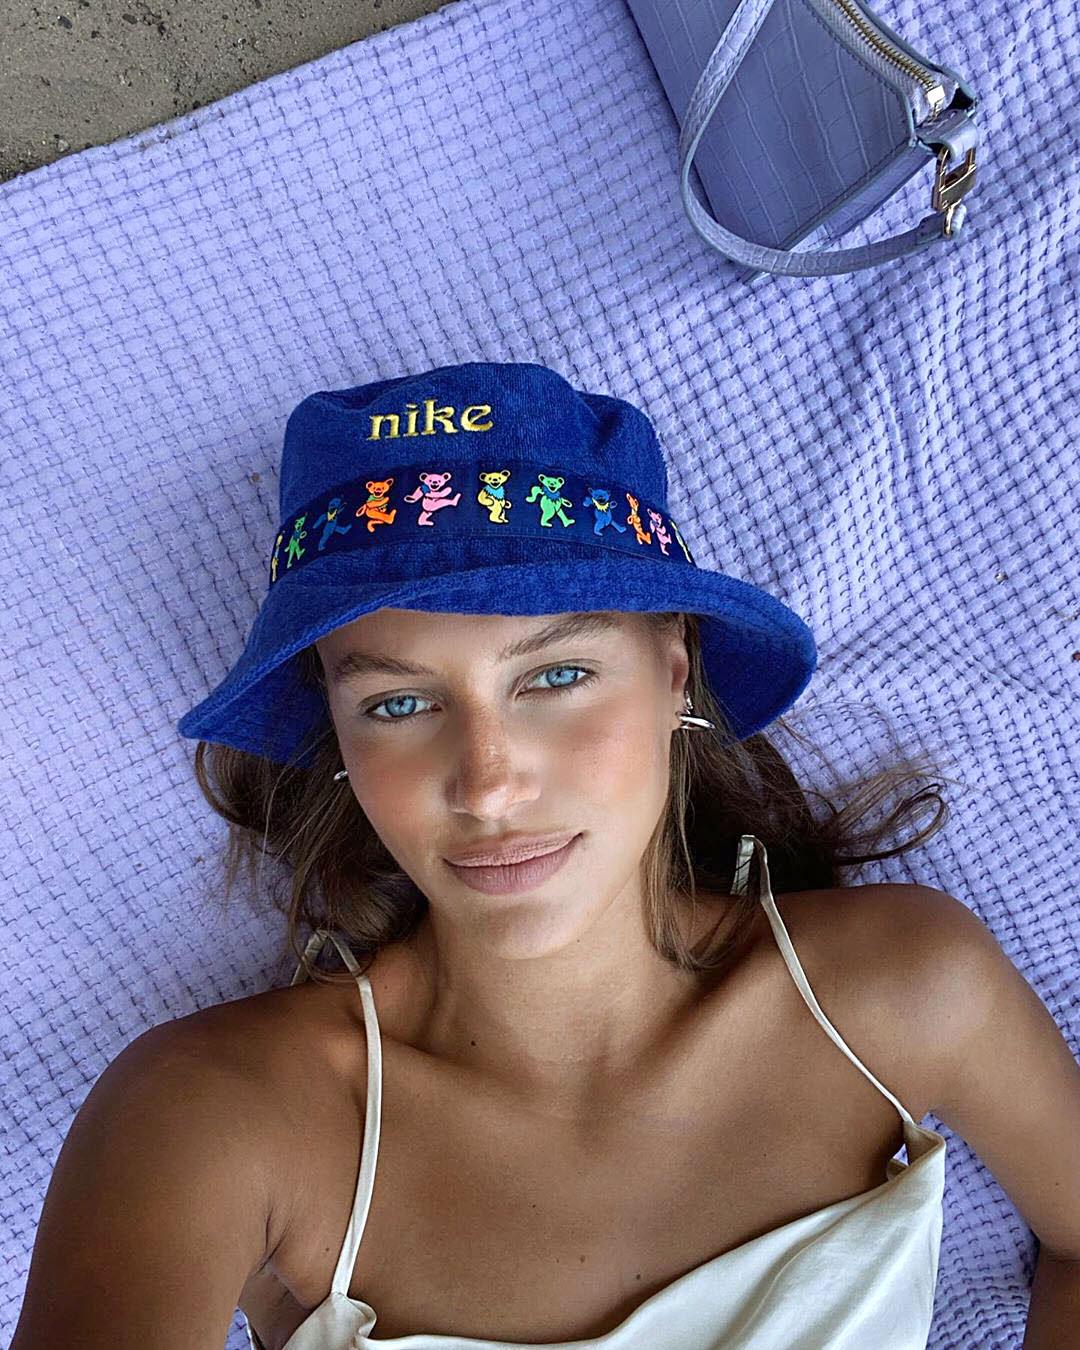 Brad Pitt S Girlfriend Nicole Poturalski 5 Things To Know